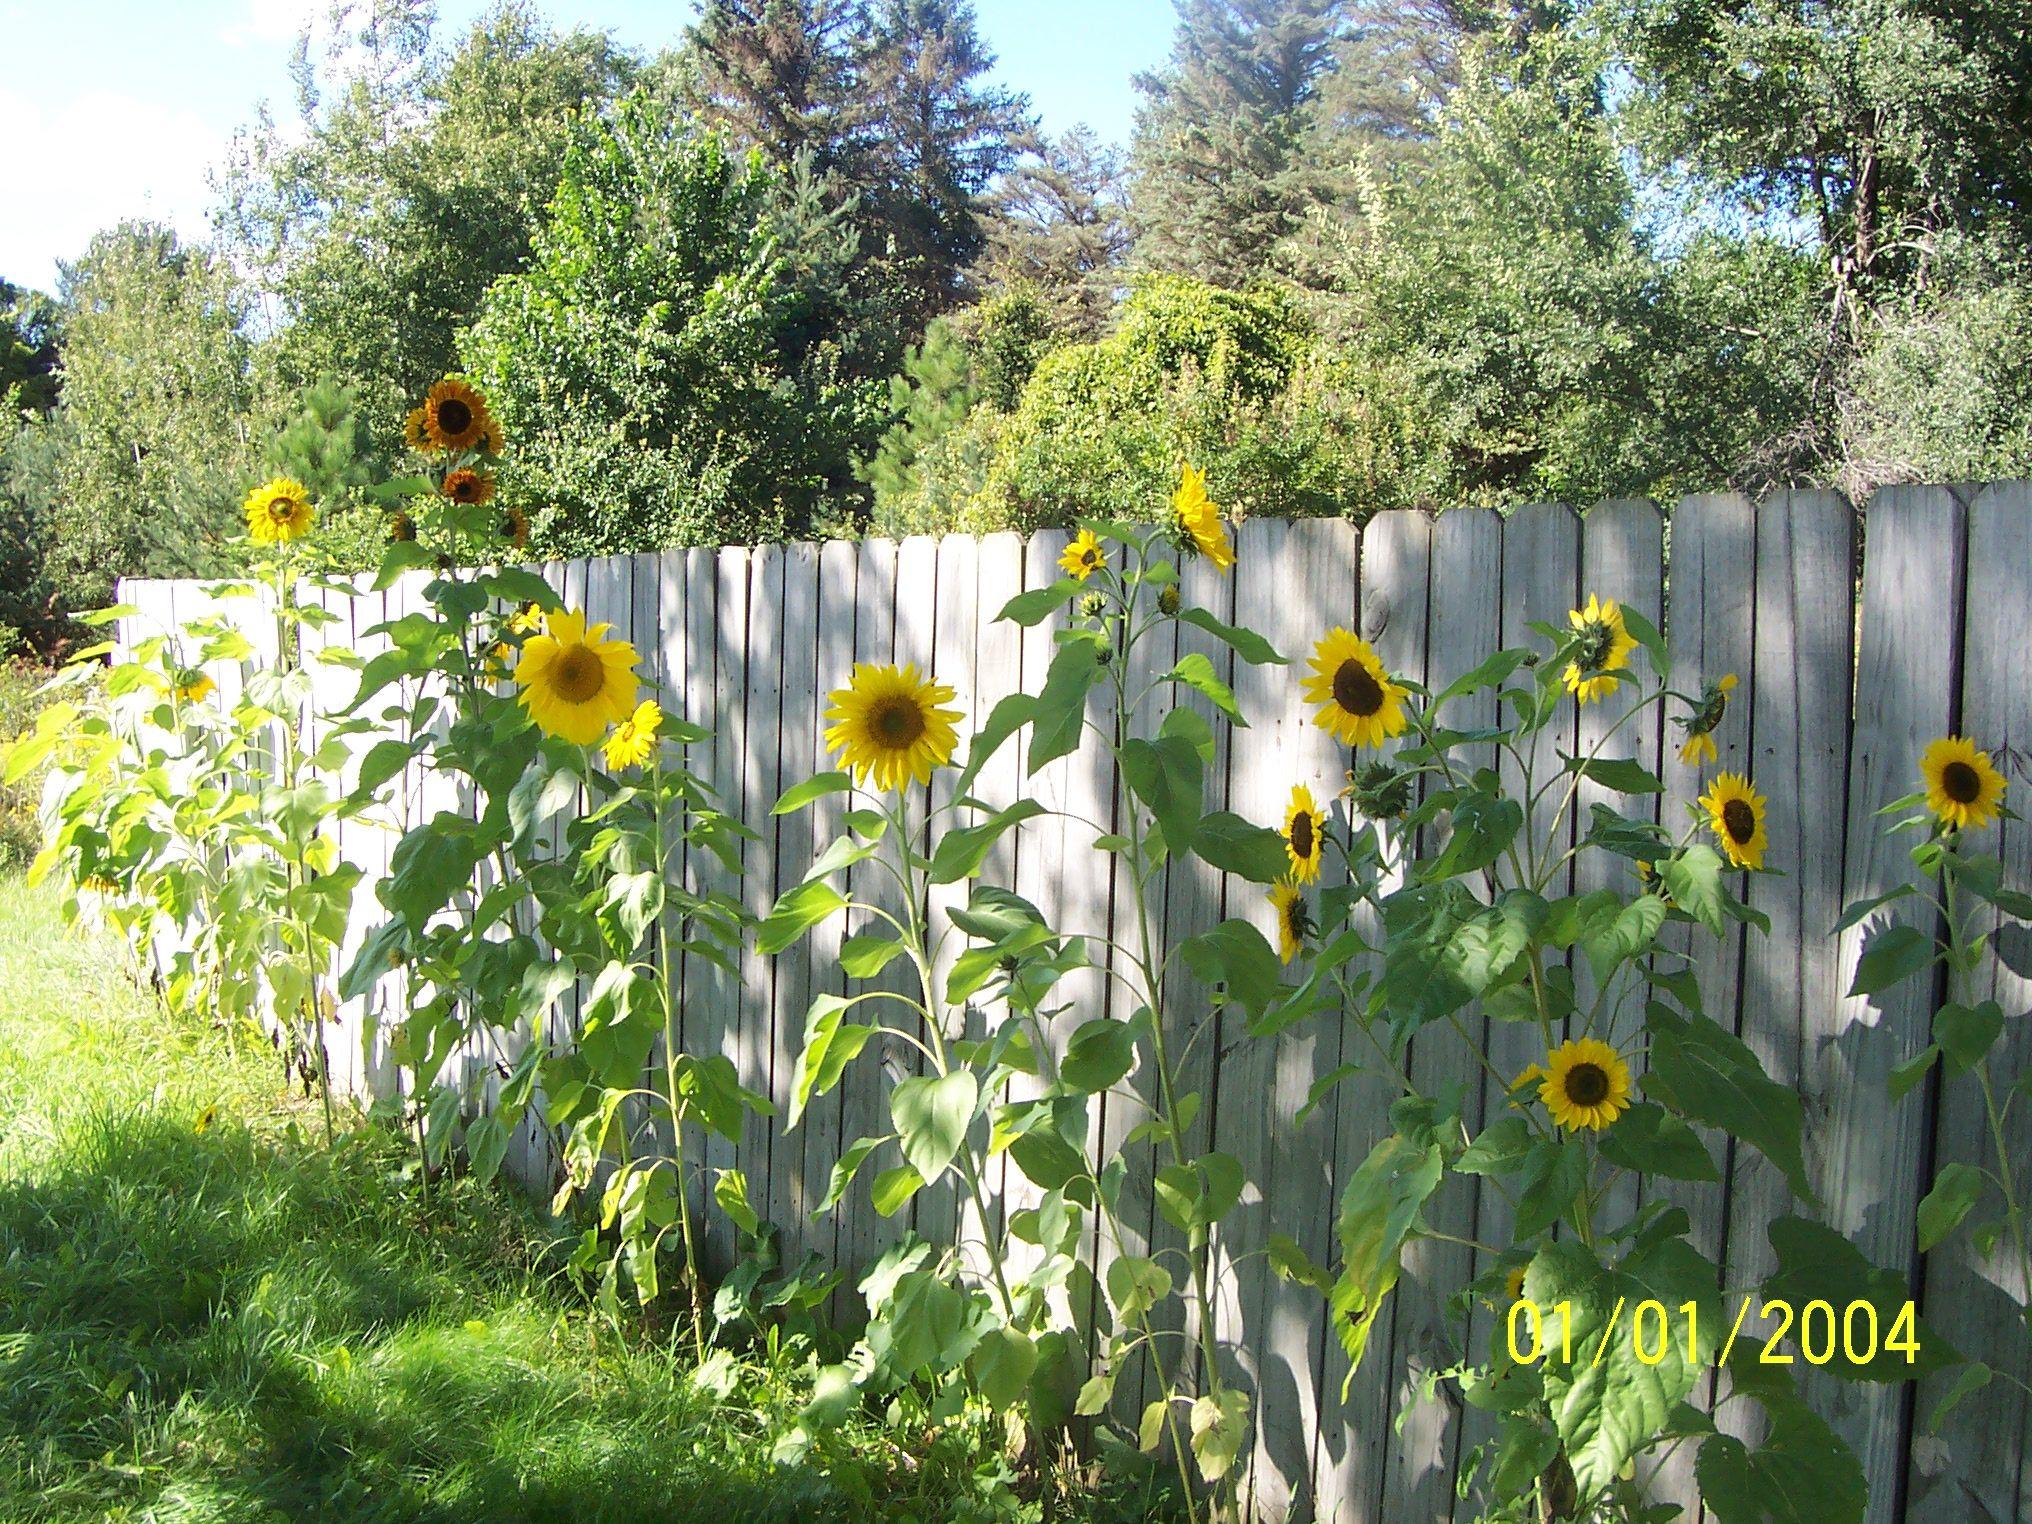 Sunflower Gardens Sunflower Pics Sunflower Pics 3 Jpg Sunflower Garden Sunflower Pictures Garden Design